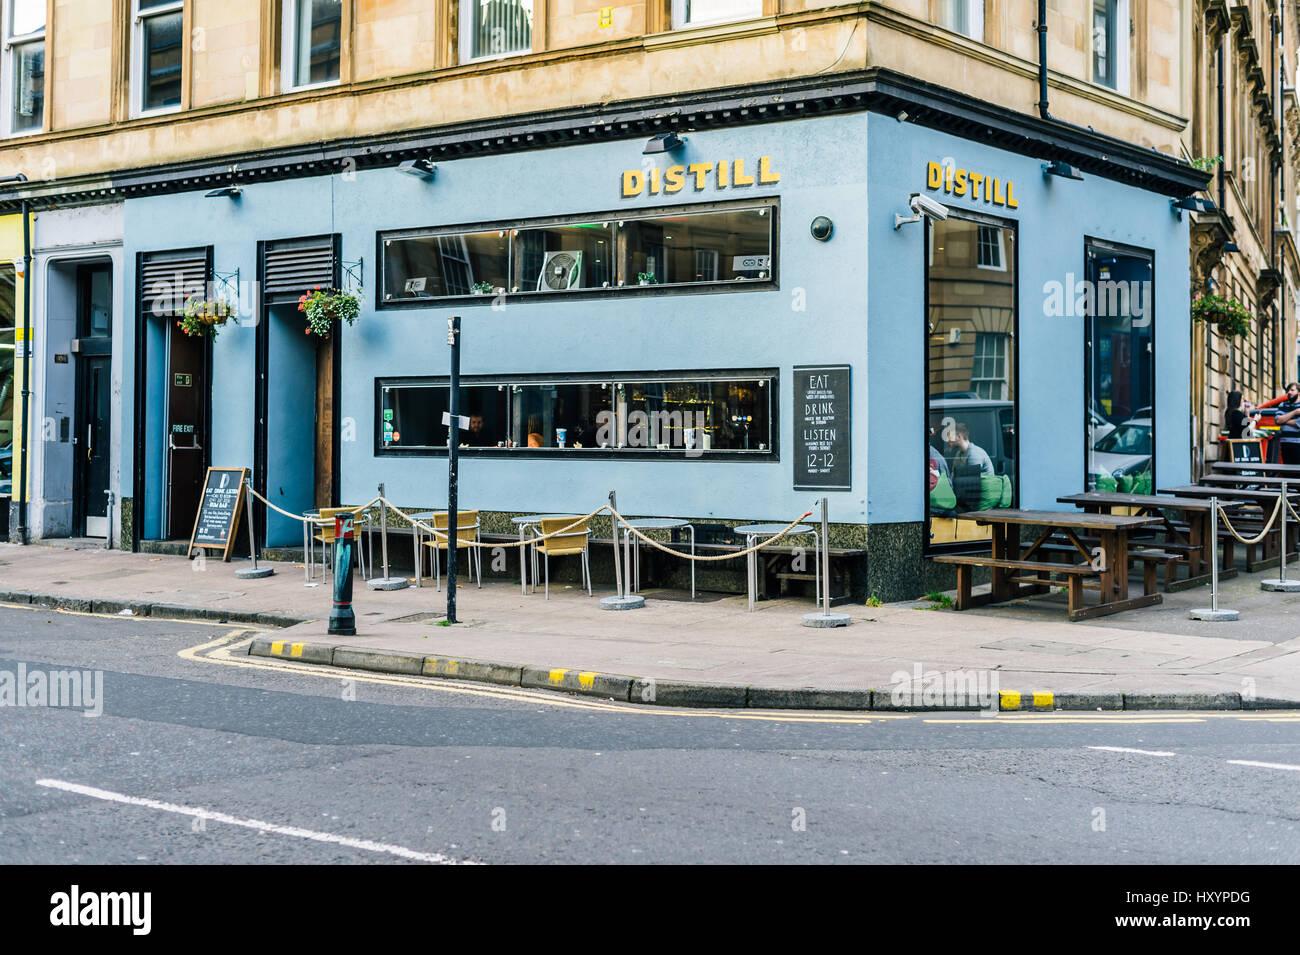 Distill Bar on Argyle Street in Glasgow's Finnieston District - Stock Image